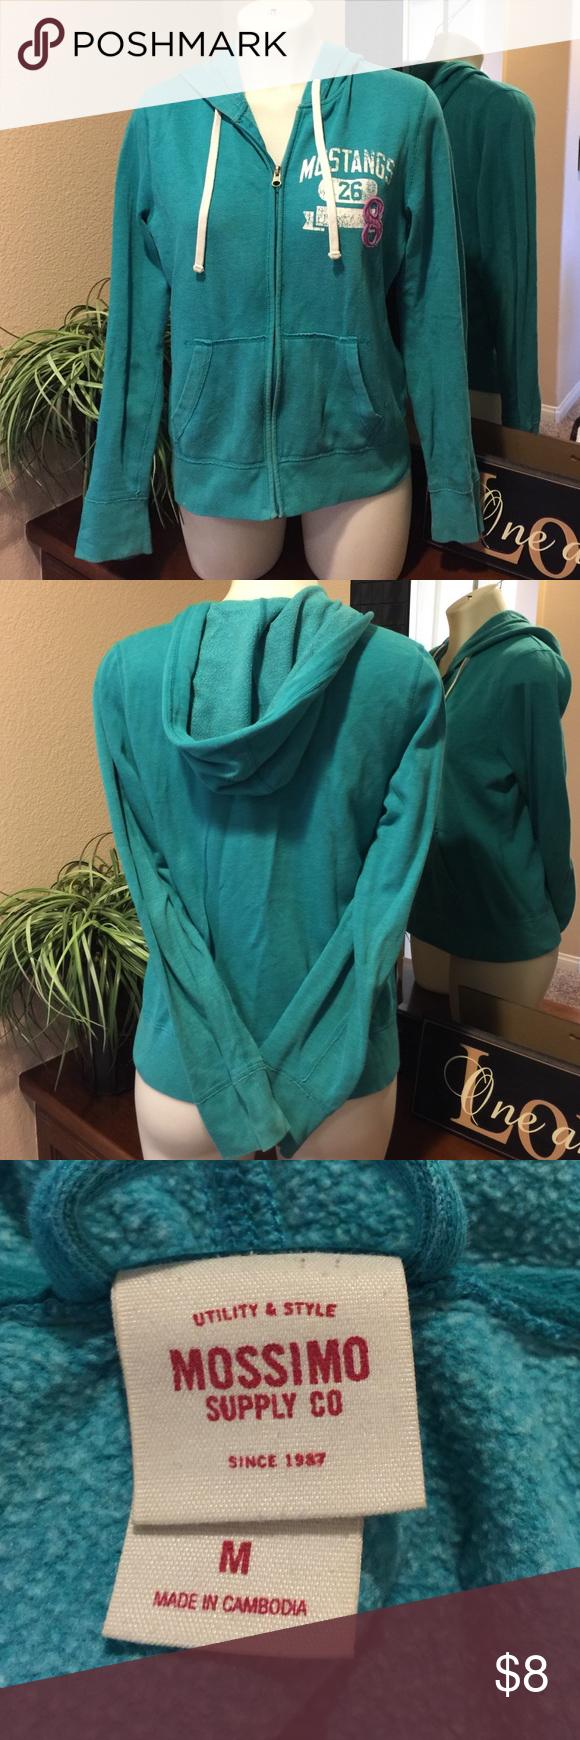 Zip Up Hoodie🌟 Super cute zip up hoodie in excellent condition, thanks for looking 😊 Mossimo Supply Co. Tops Sweatshirts & Hoodies